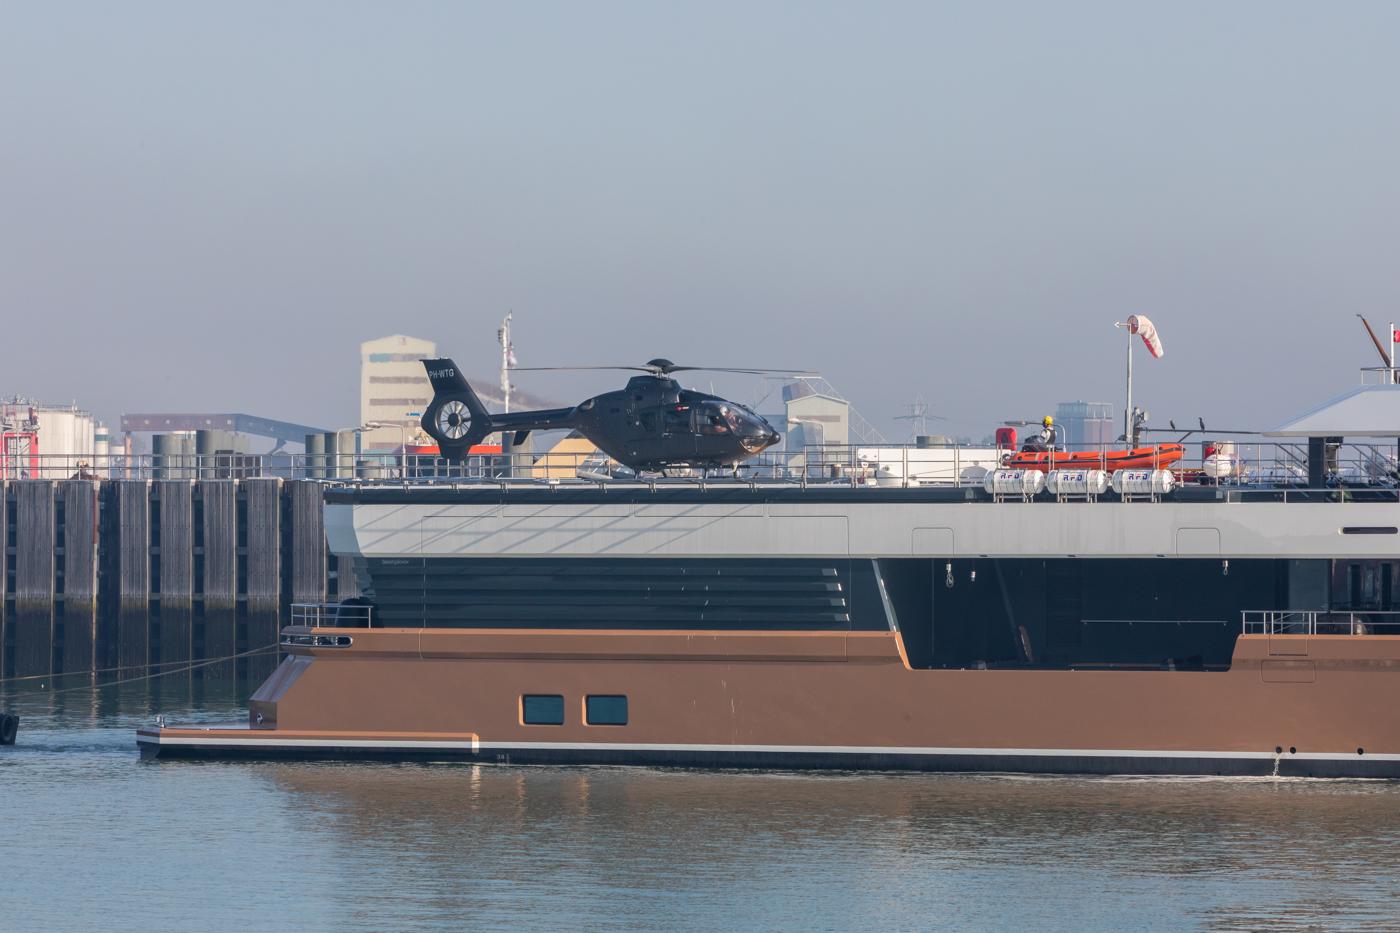 Yacht-La-Datcha-77-Heliski-Russia-3